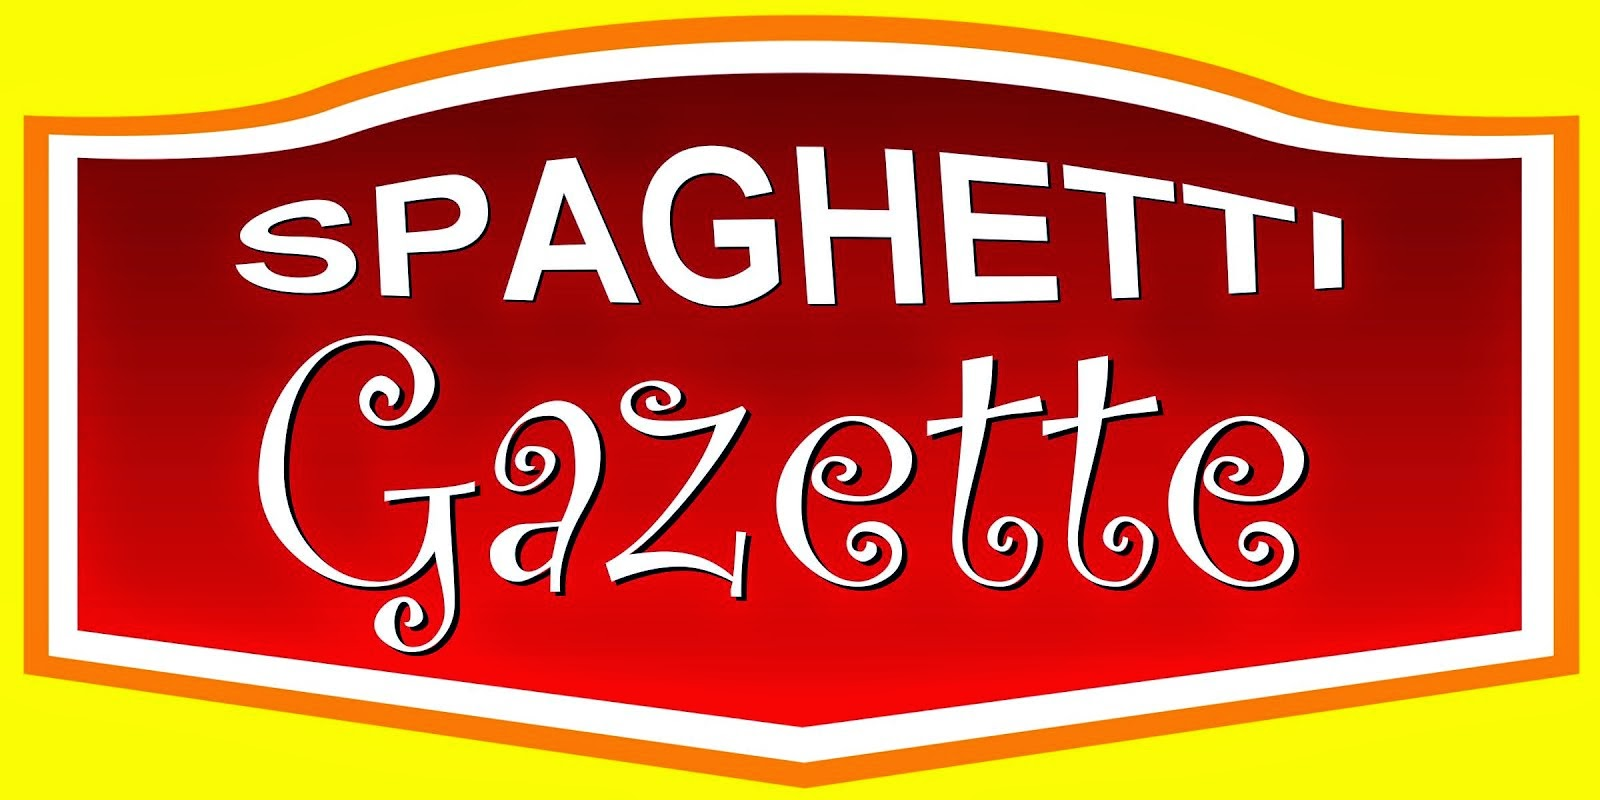 Spaghetti Gazette